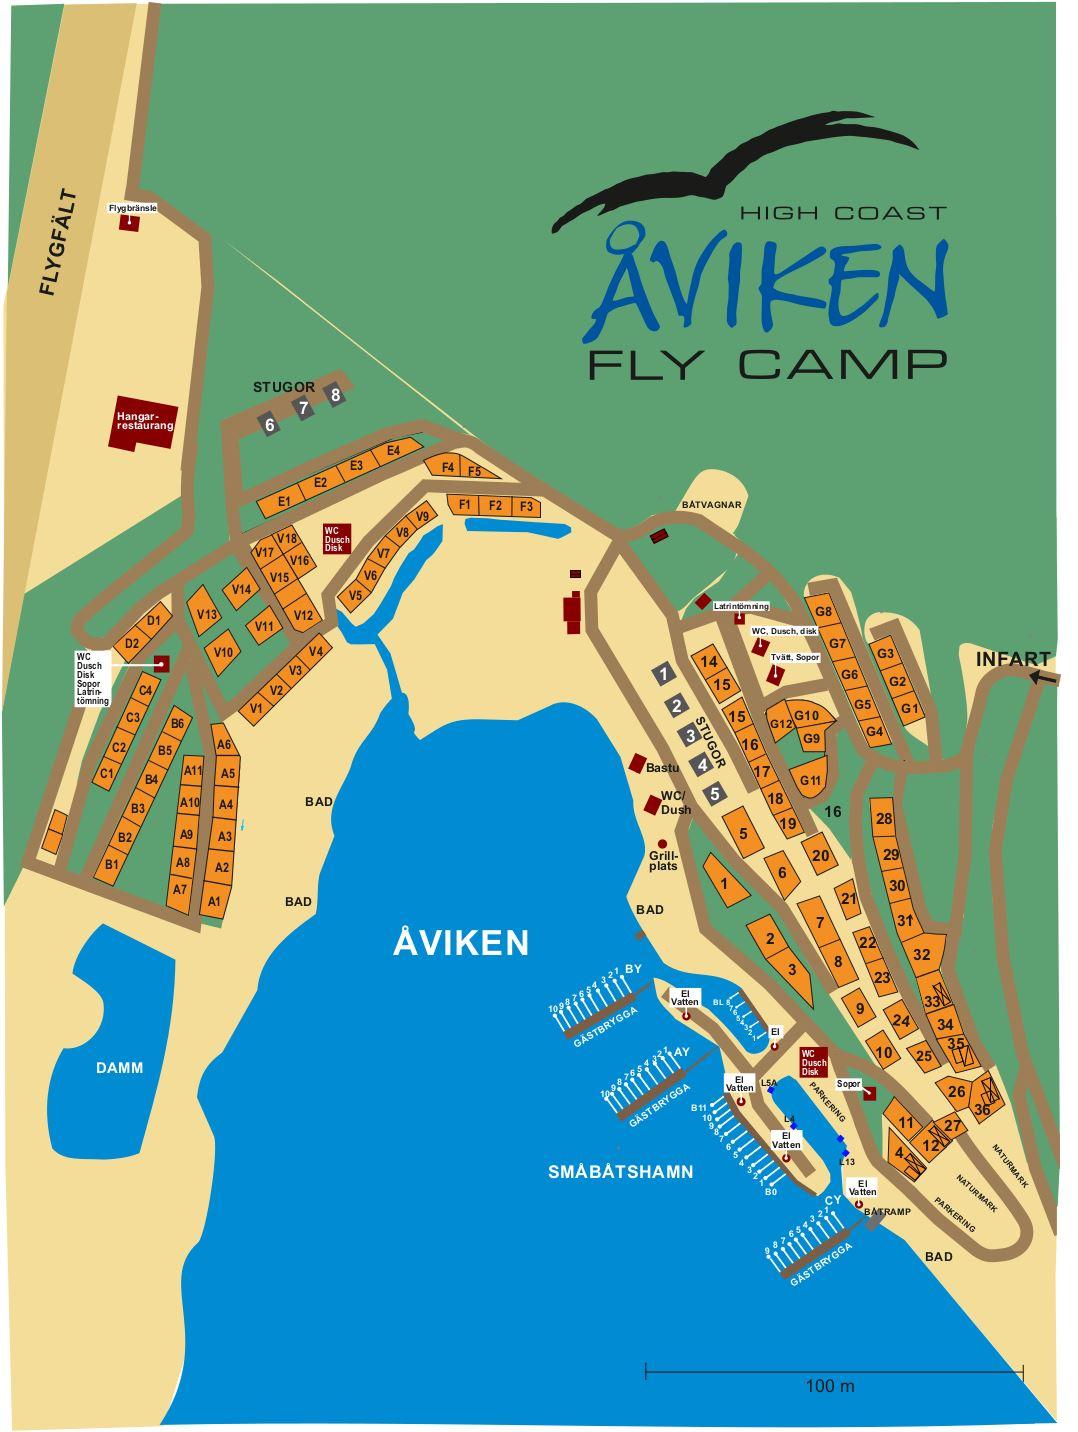 Åviken Fly Camp